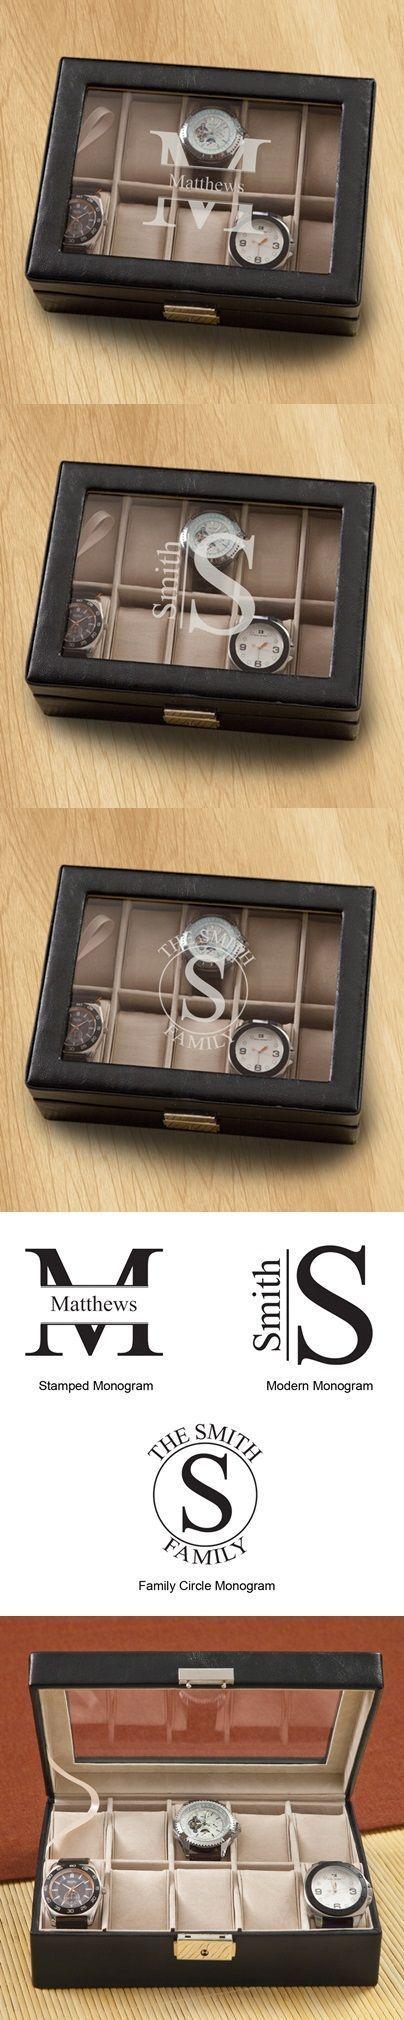 Monogrammed Men's Hinged-Lid Black Leather Watch Box